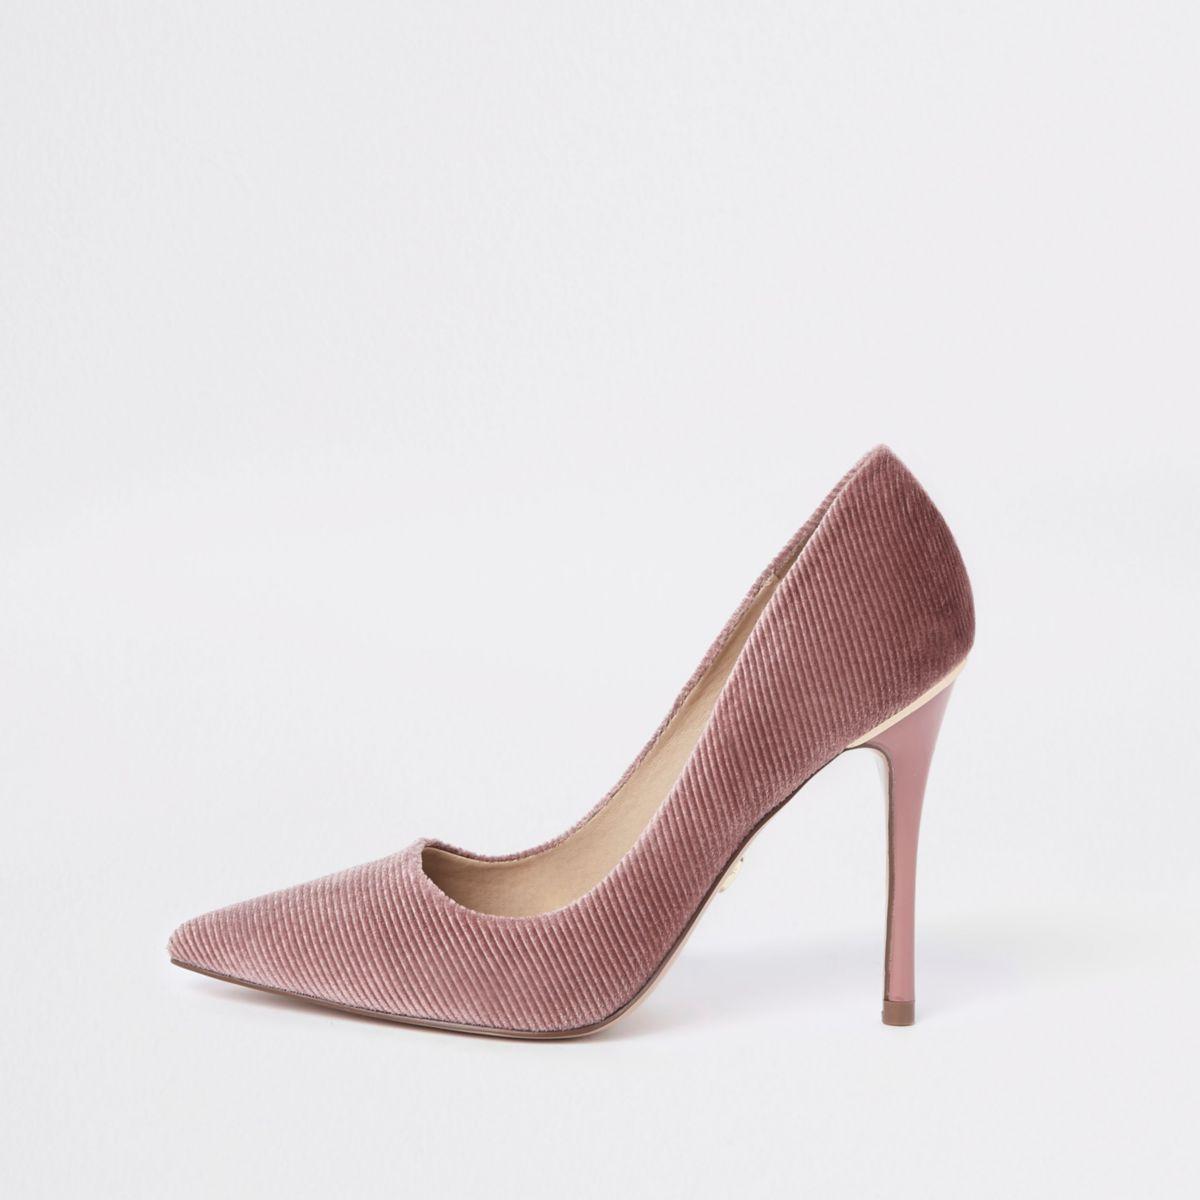 Pink corduroy pumps